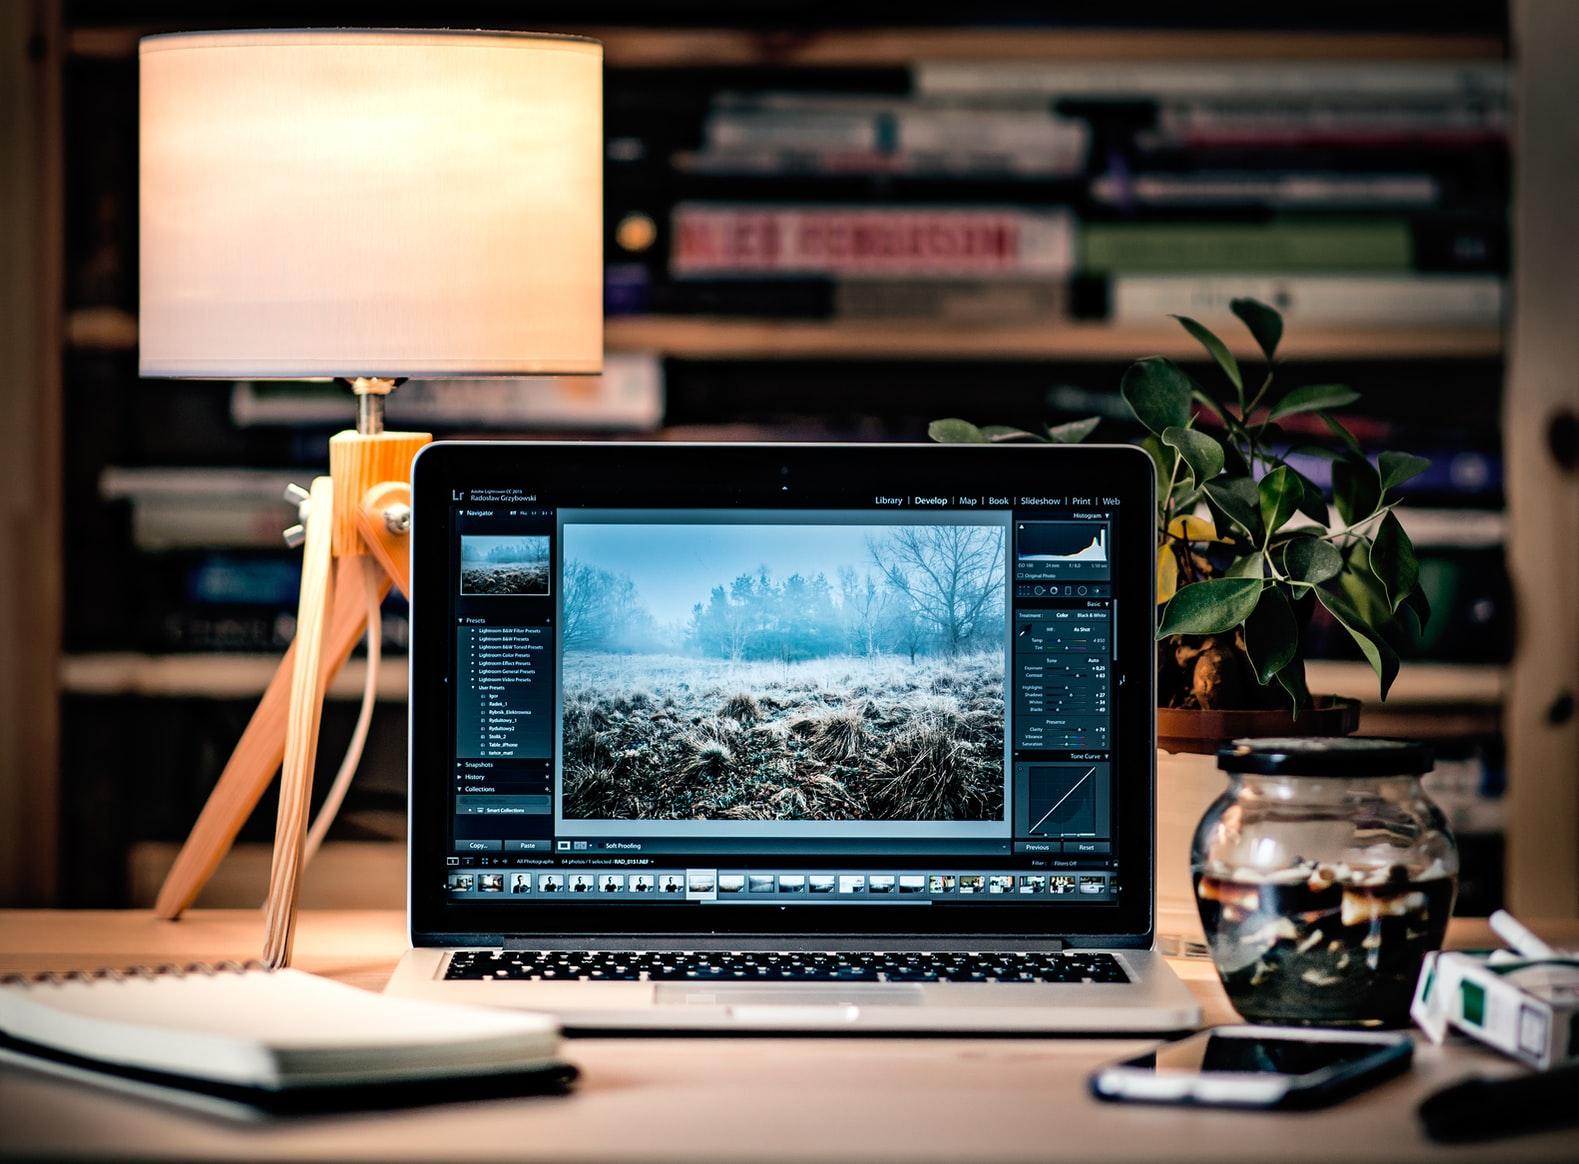 macbook-refurbished